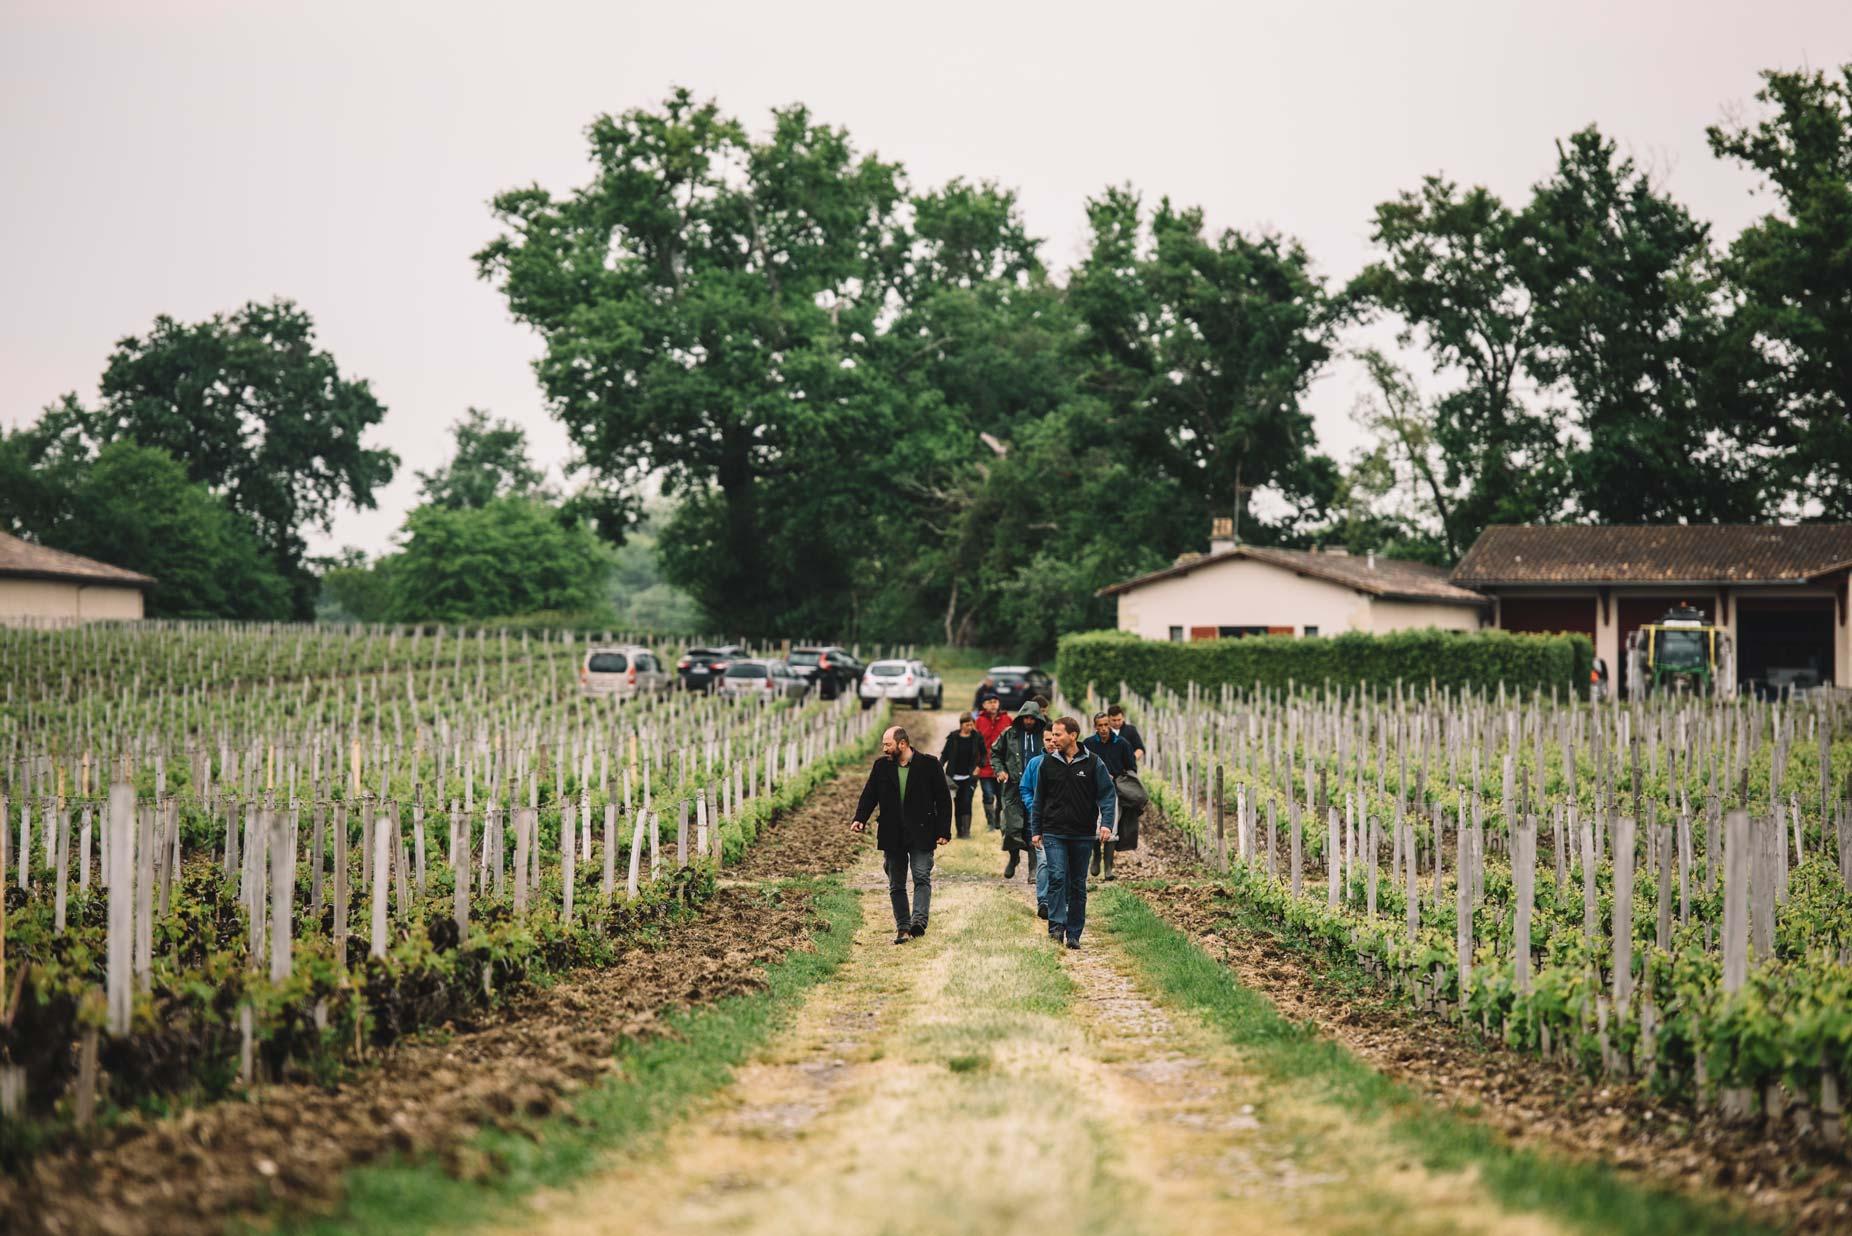 Spring training   Château Haut-Bailly   Pessac   Bordeaux